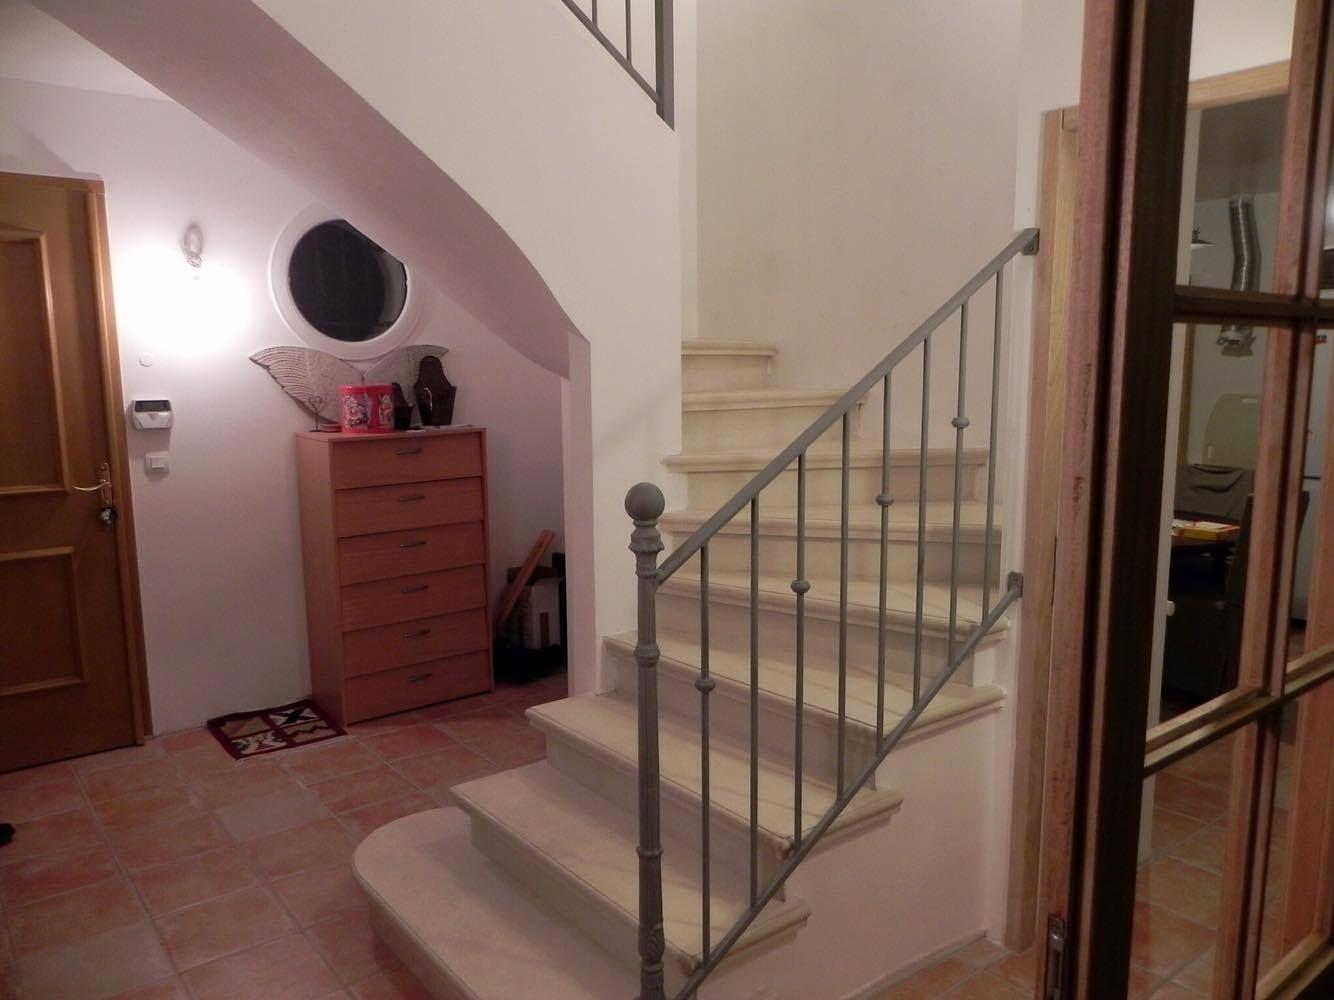 Fabrication Et Pose D Escalier En Beton Teinte A Carcassonne Et Toulouse Escalier Beton Beton Teinte Escalier